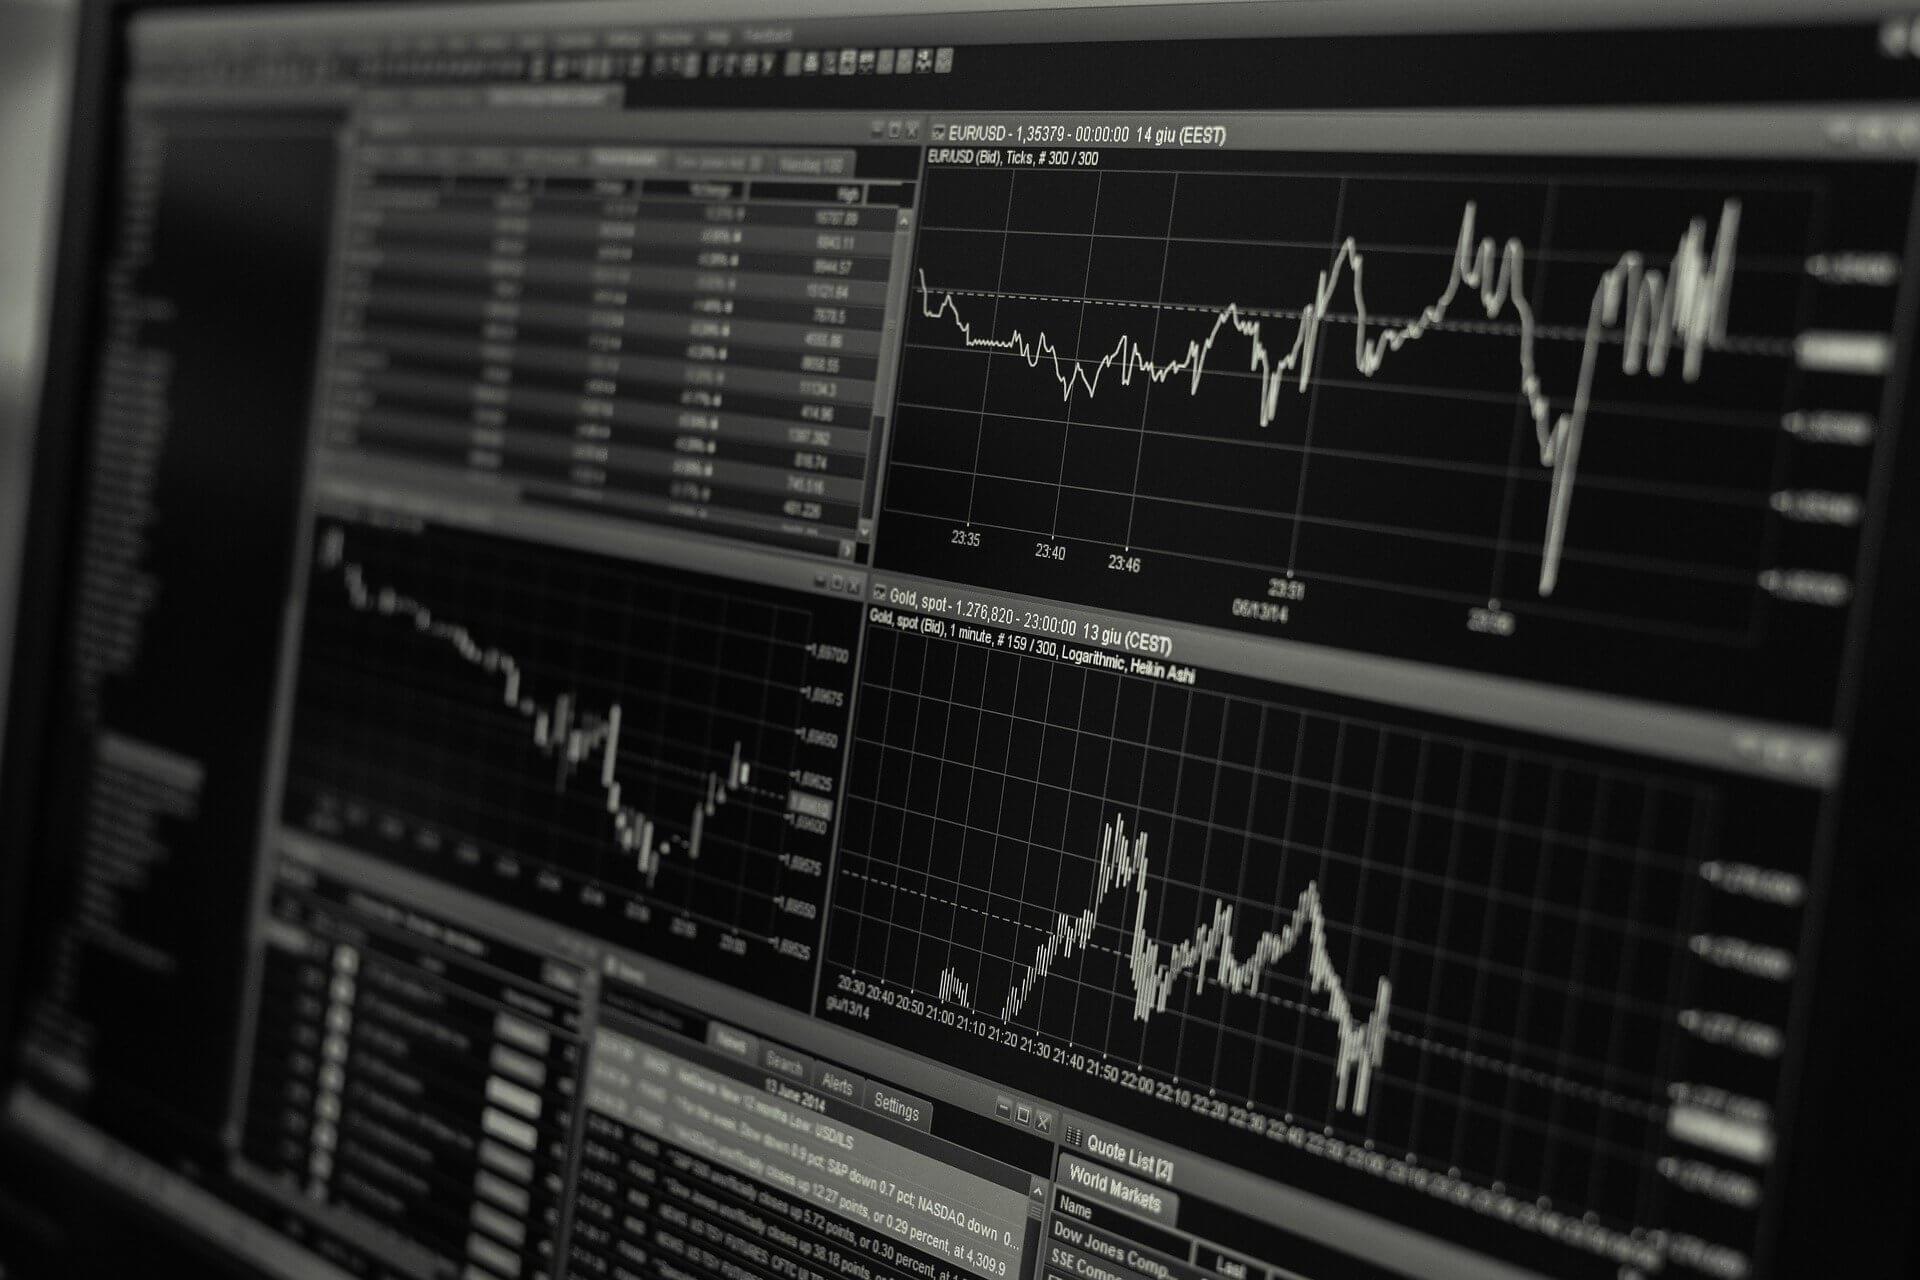 Machine learning in fintech stock data